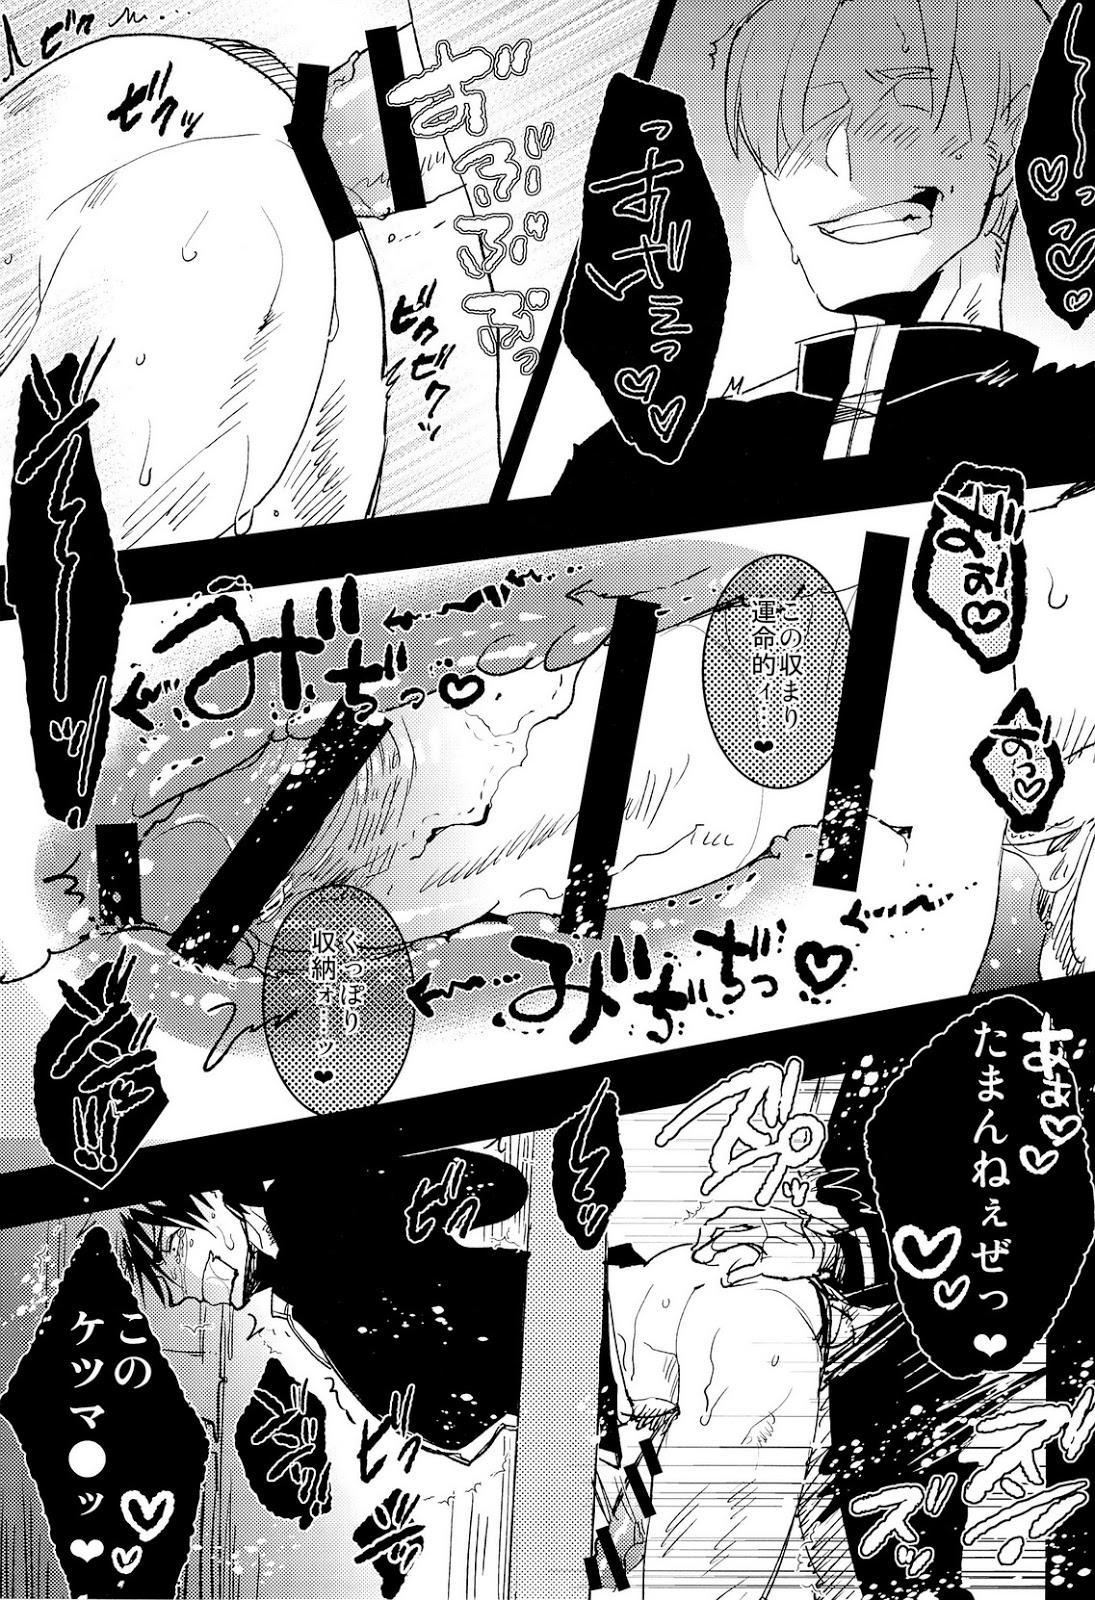 Kabejiri Hon - DK Fuck 10